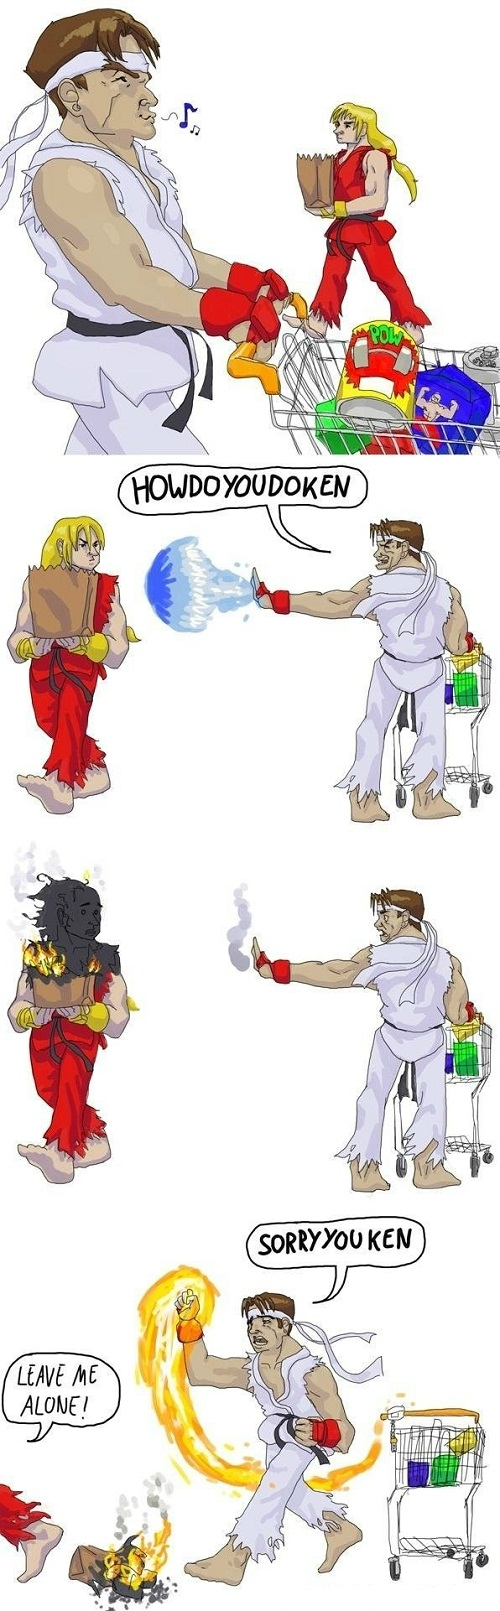 How Do You Do Ken? - Street Fighter